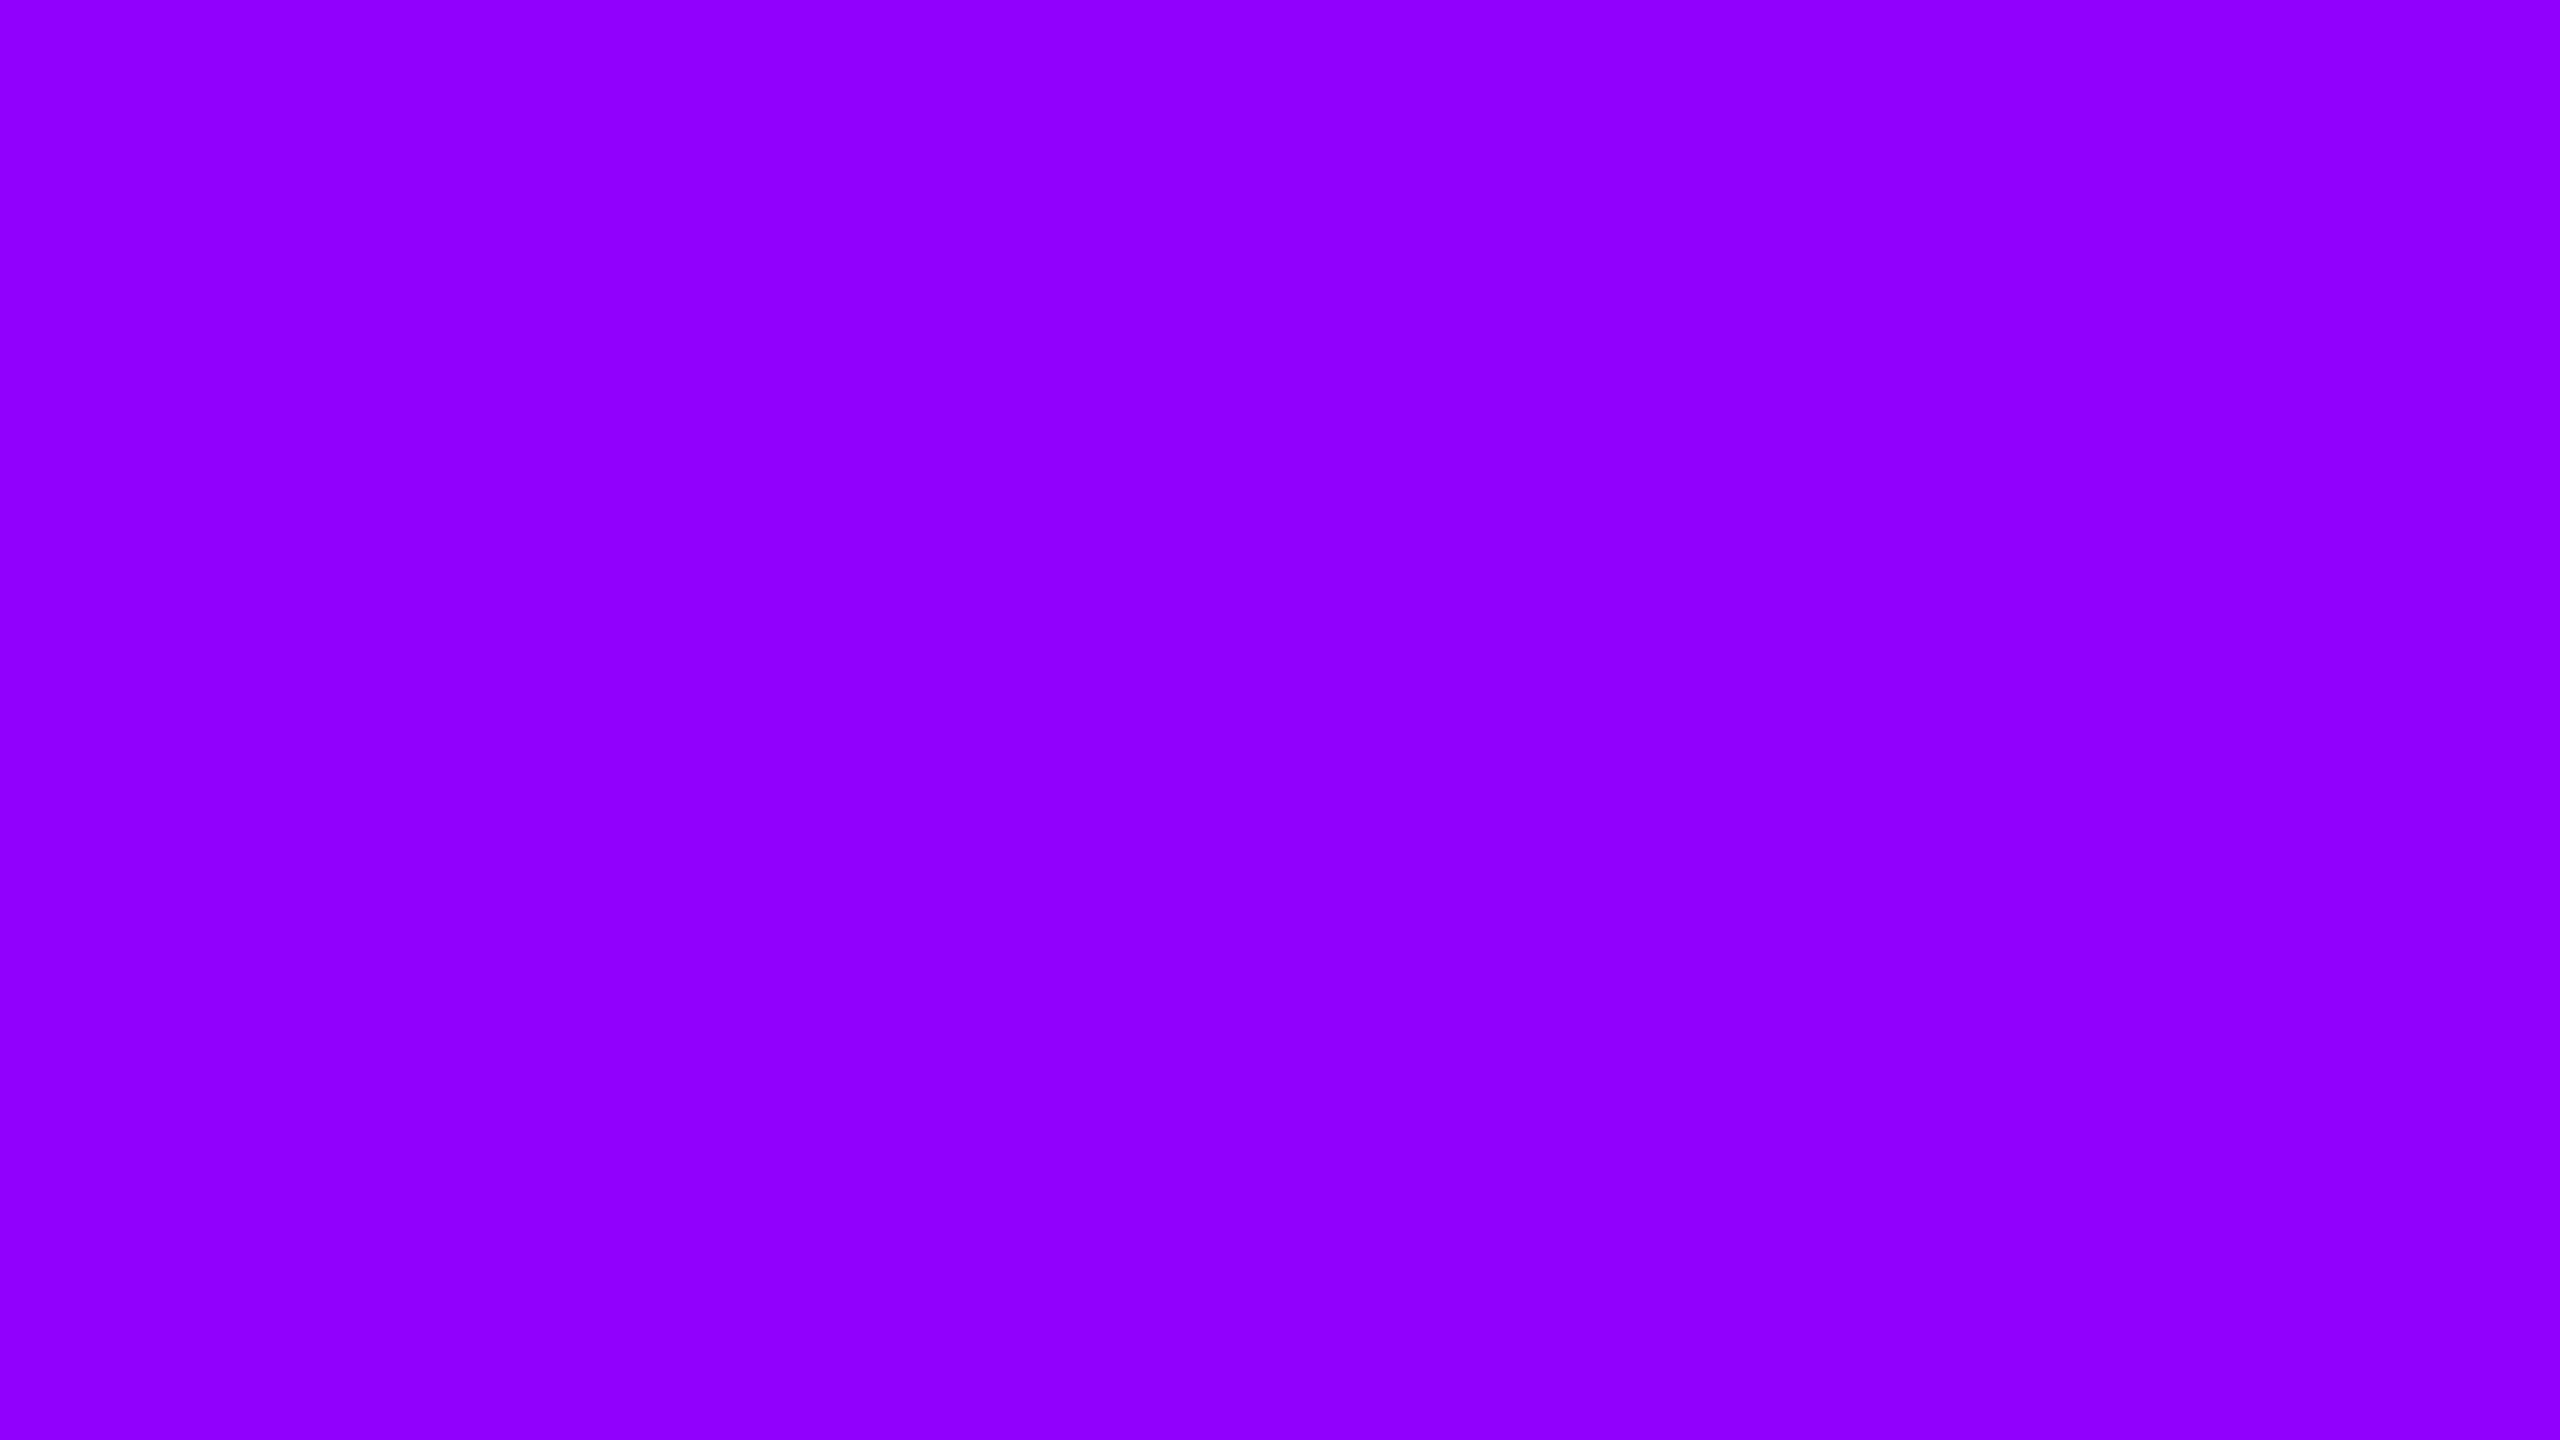 2560x1440 Electric Violet Solid Color Background